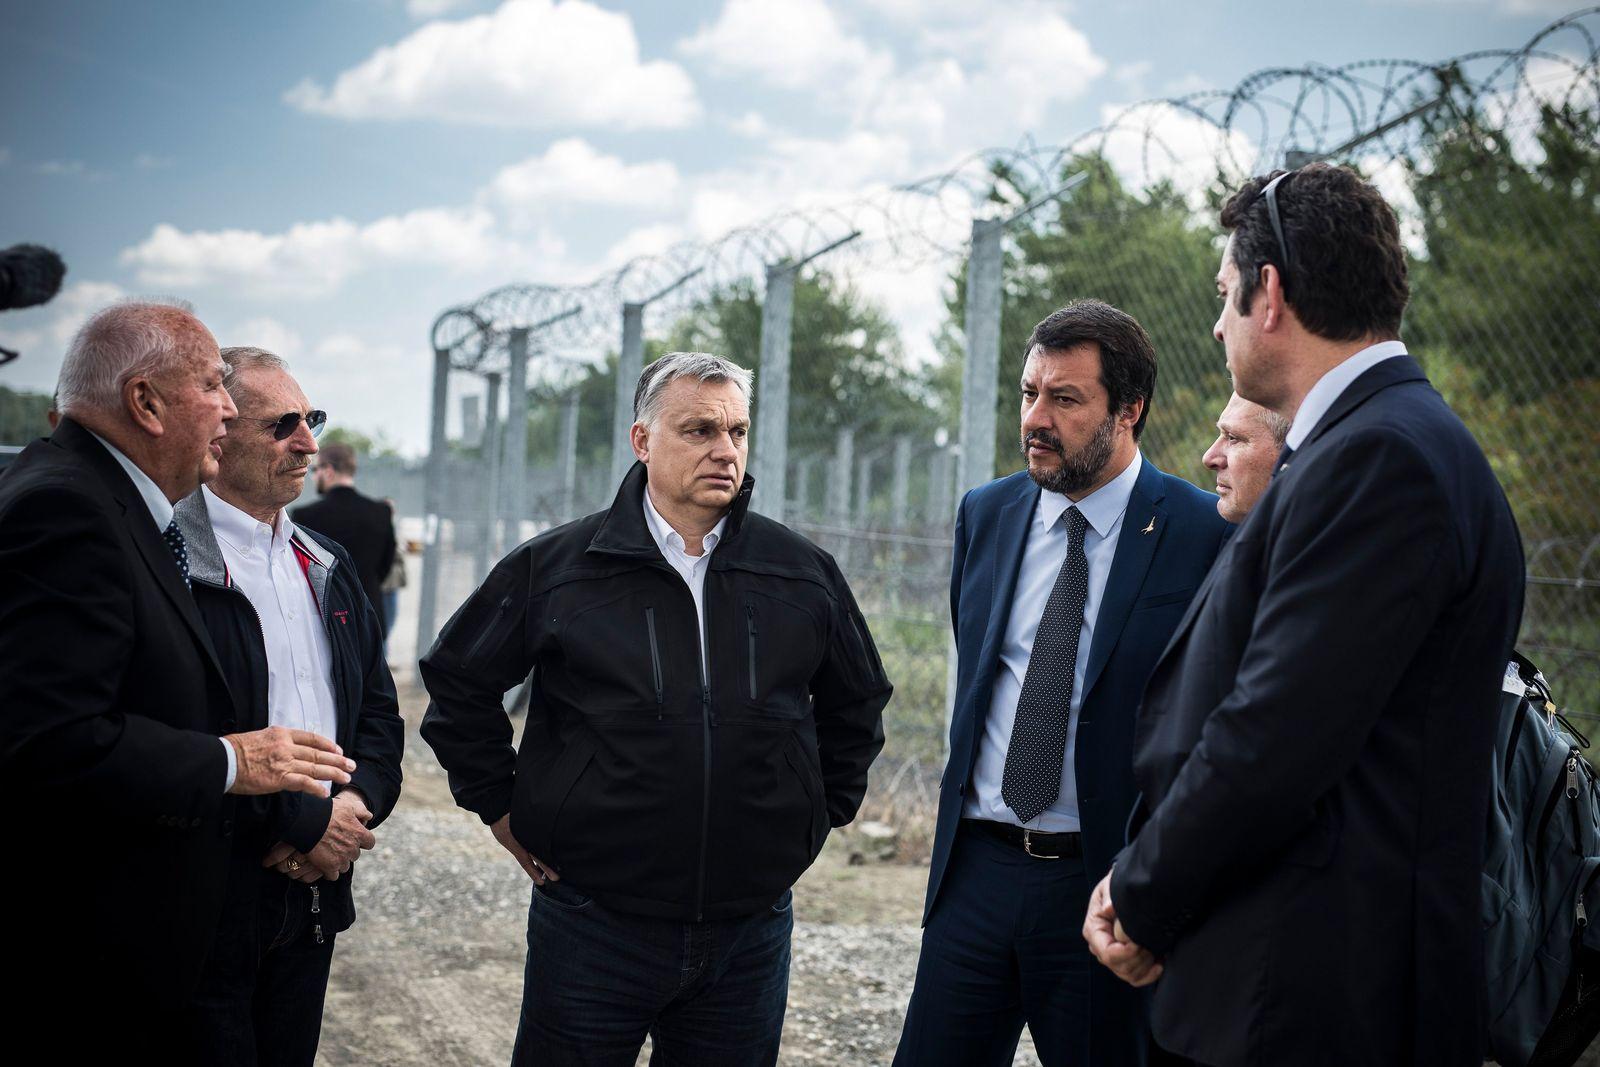 Viktor Orban / Matteo Salvini